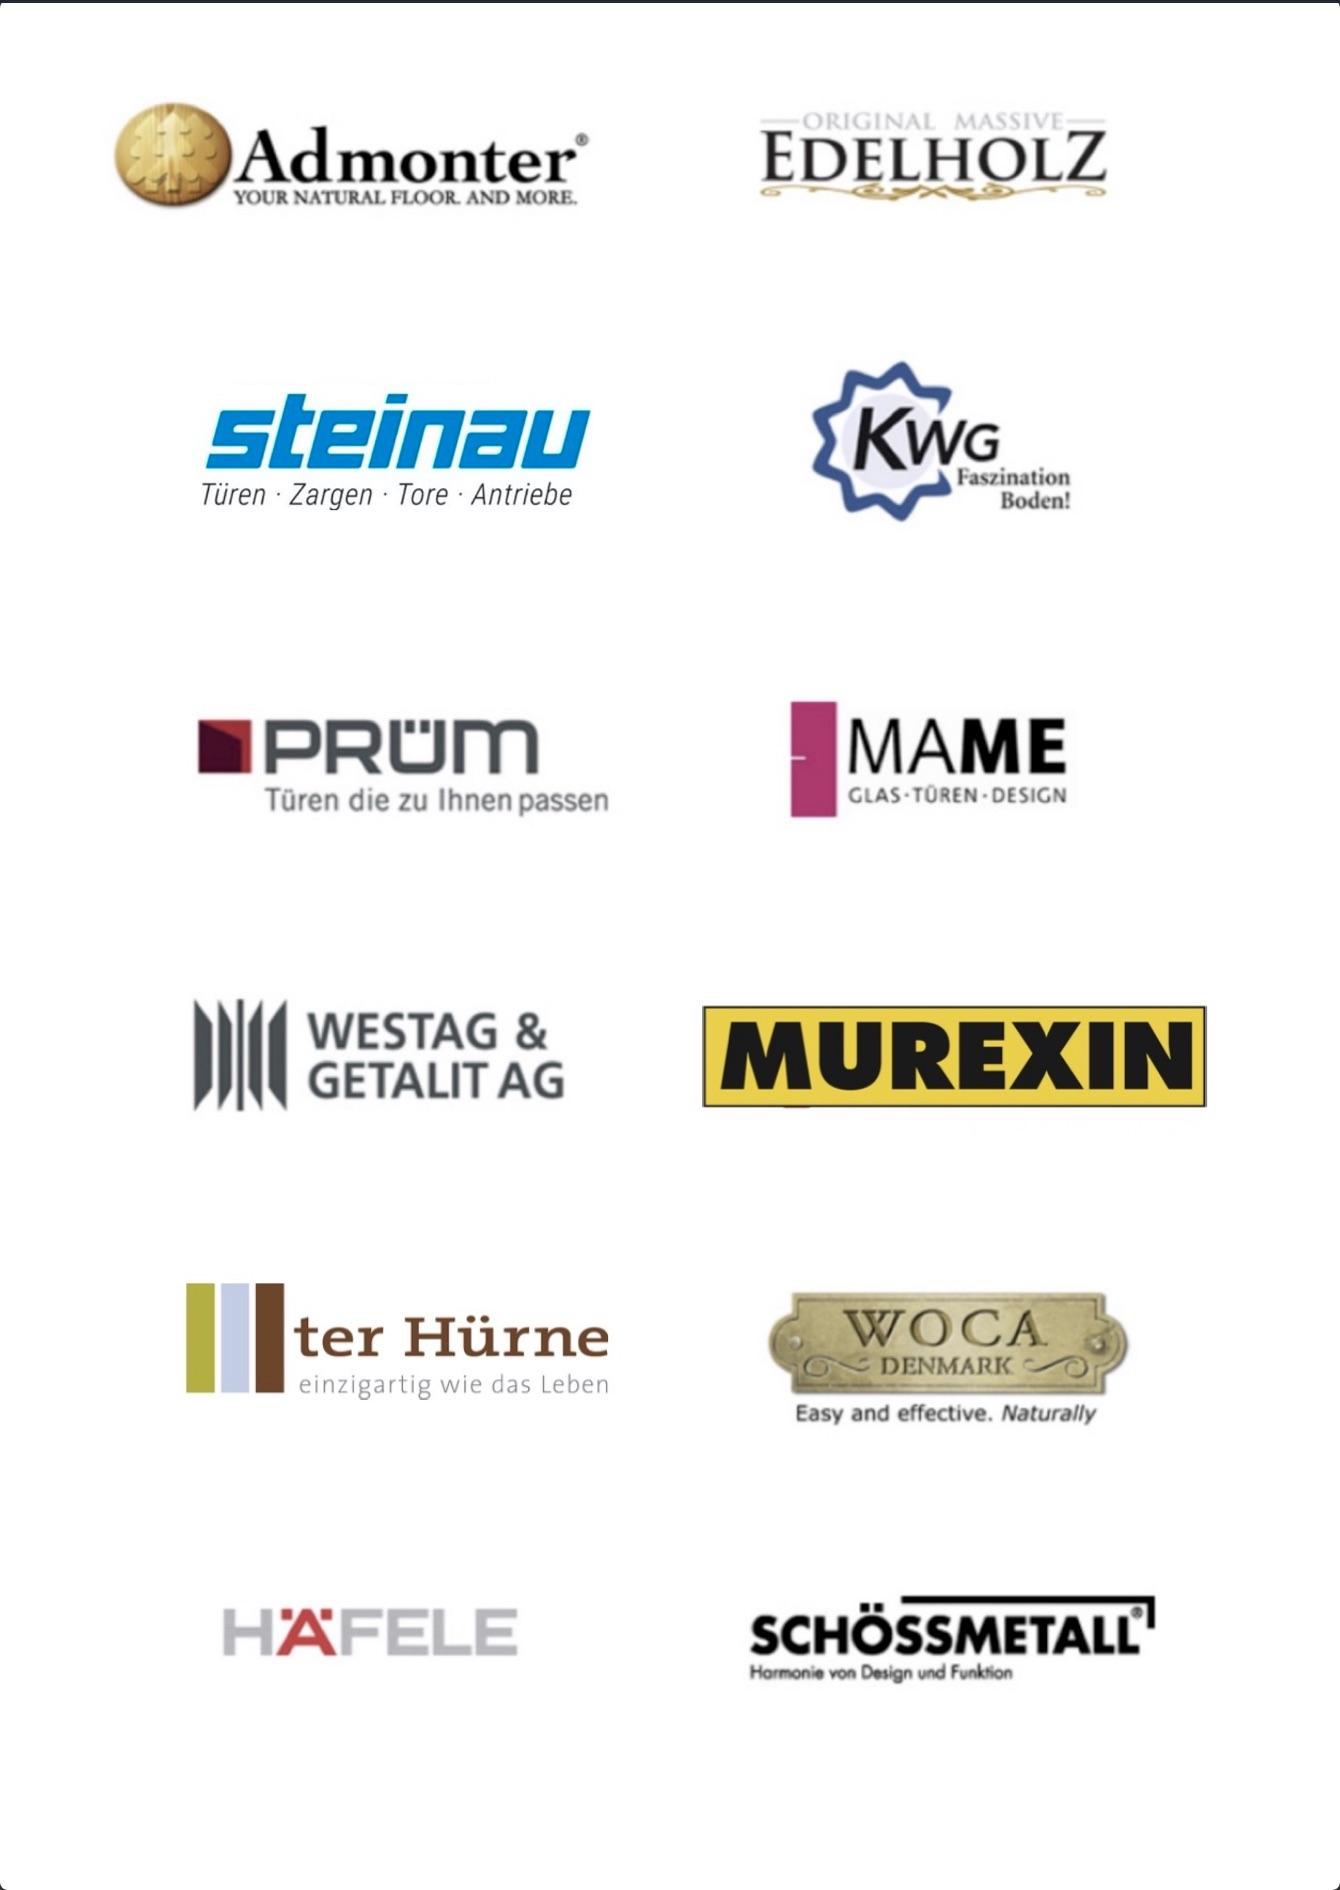 Screenshot_2020-12-21 Hersteller Marken Lehndorf Parkett